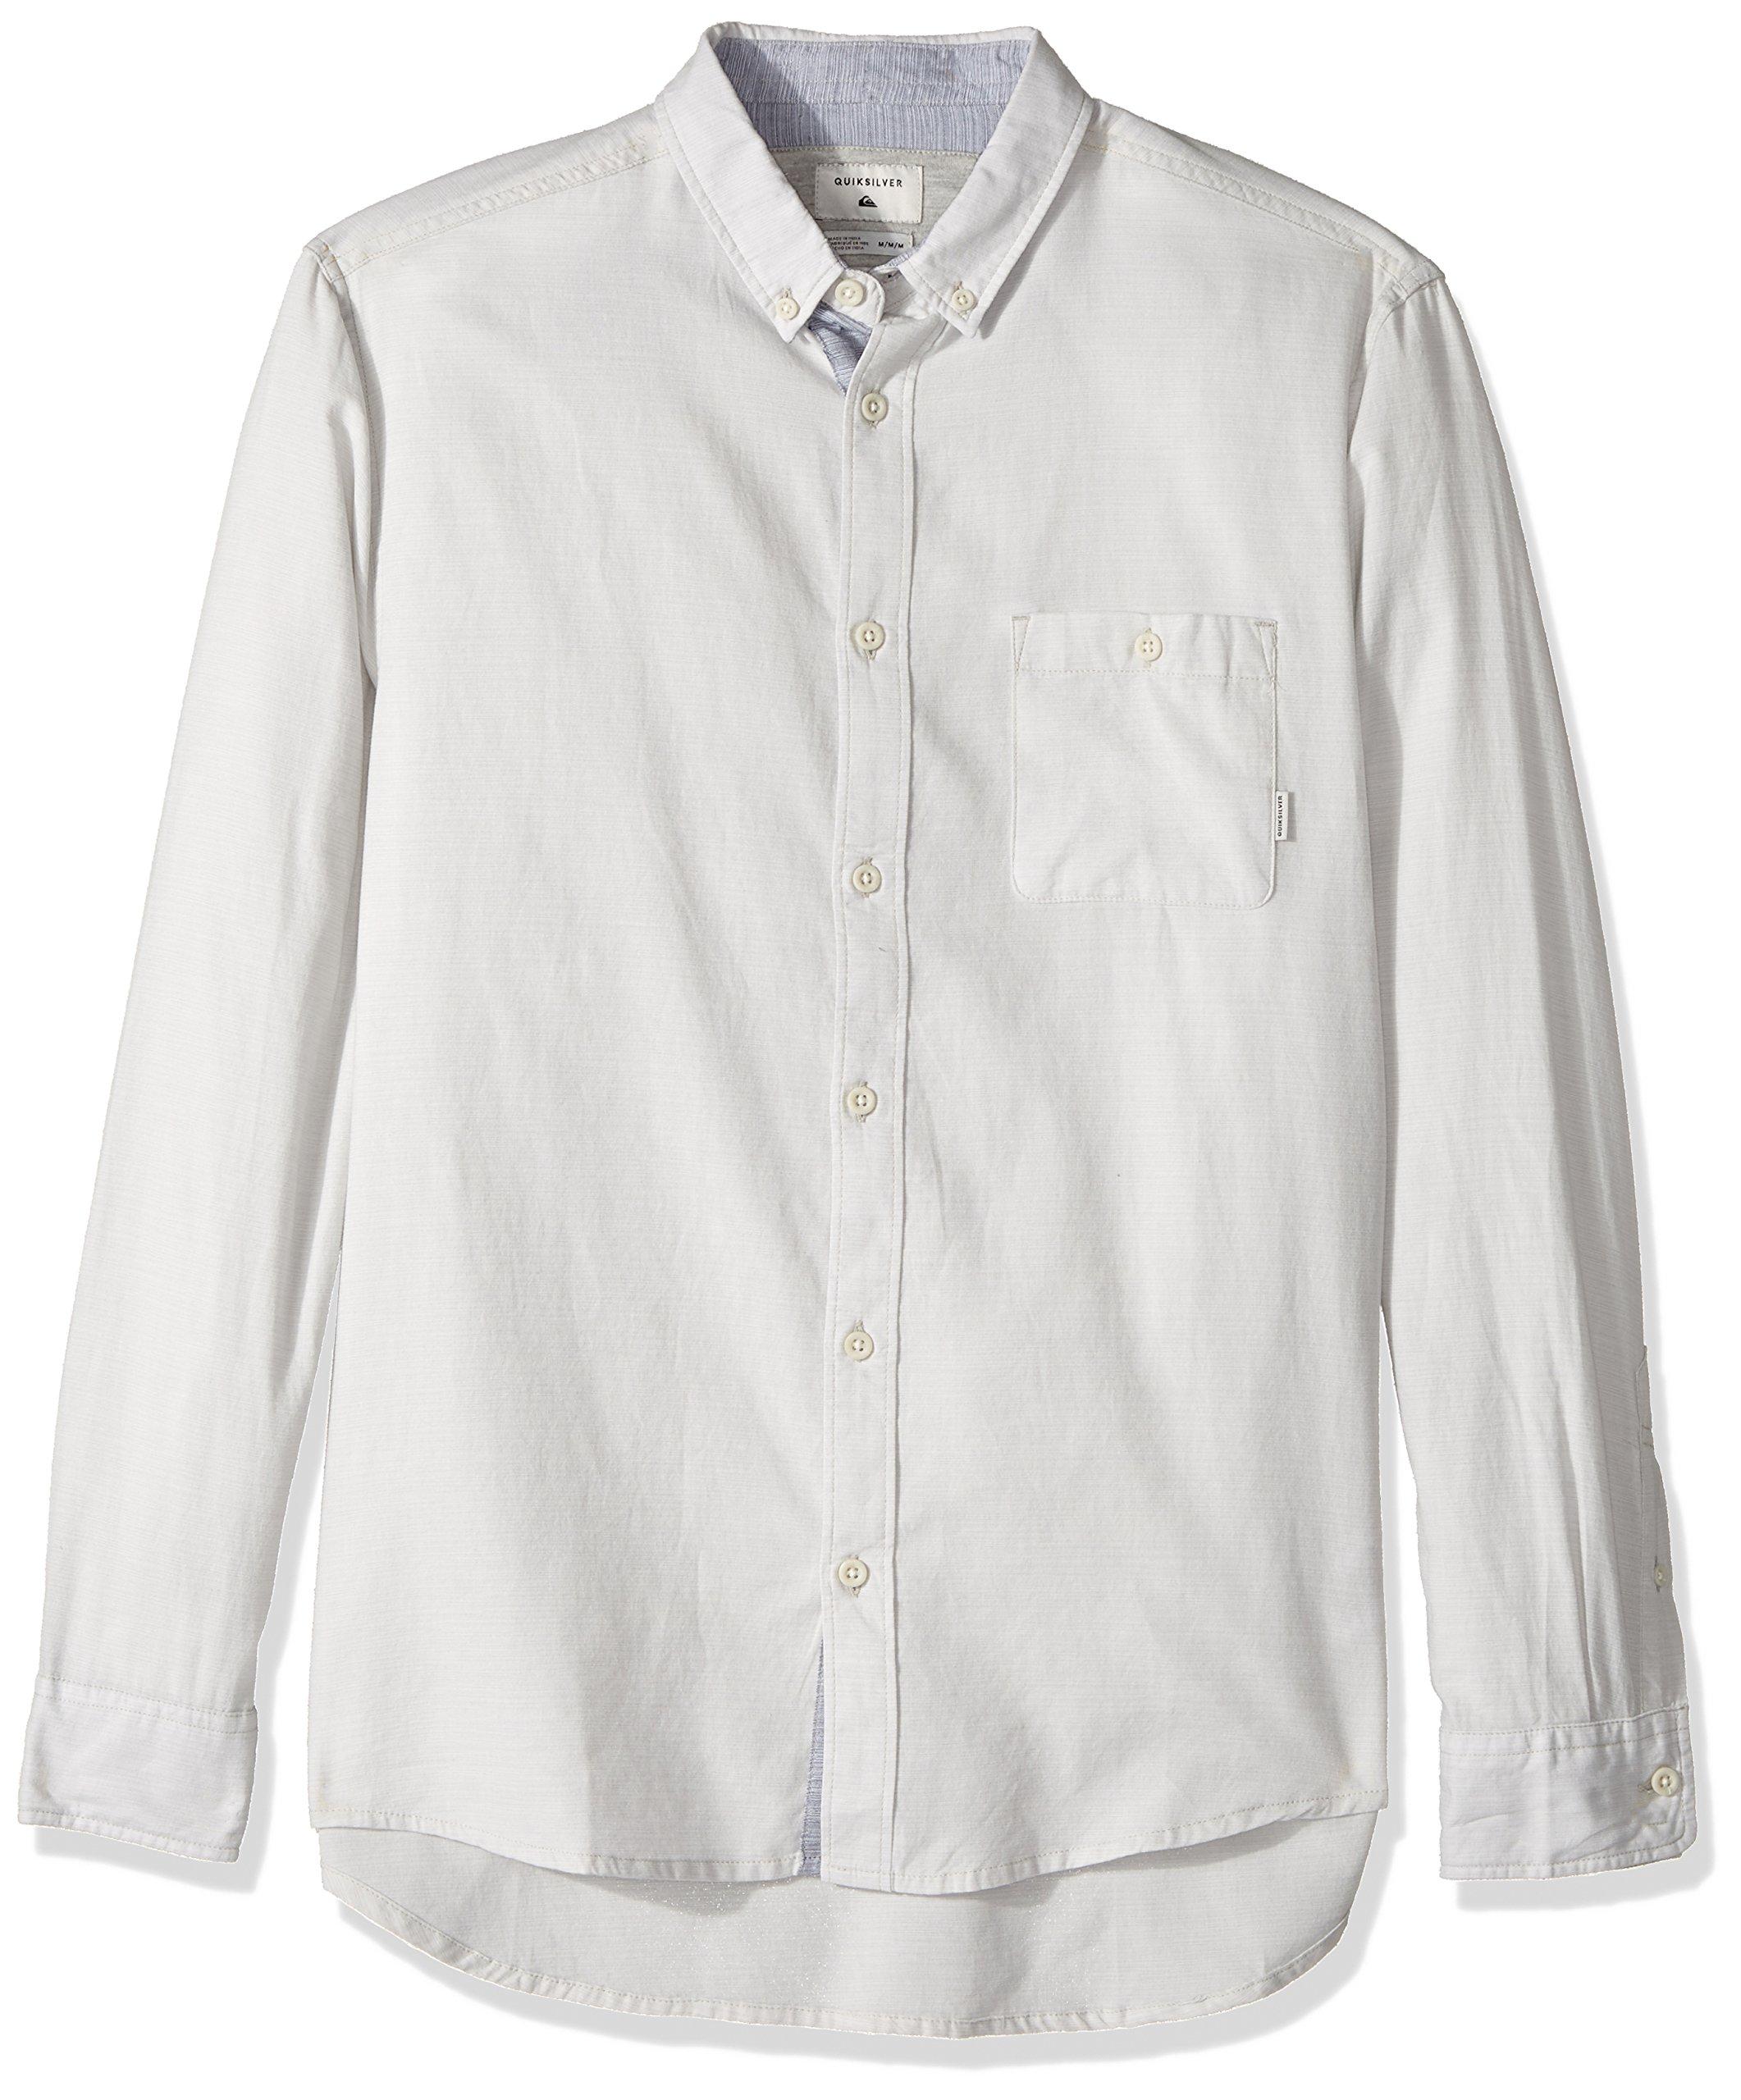 Quiksilver Men's Waterfalls Long Sleeve Shirt, Micro Chip, Large